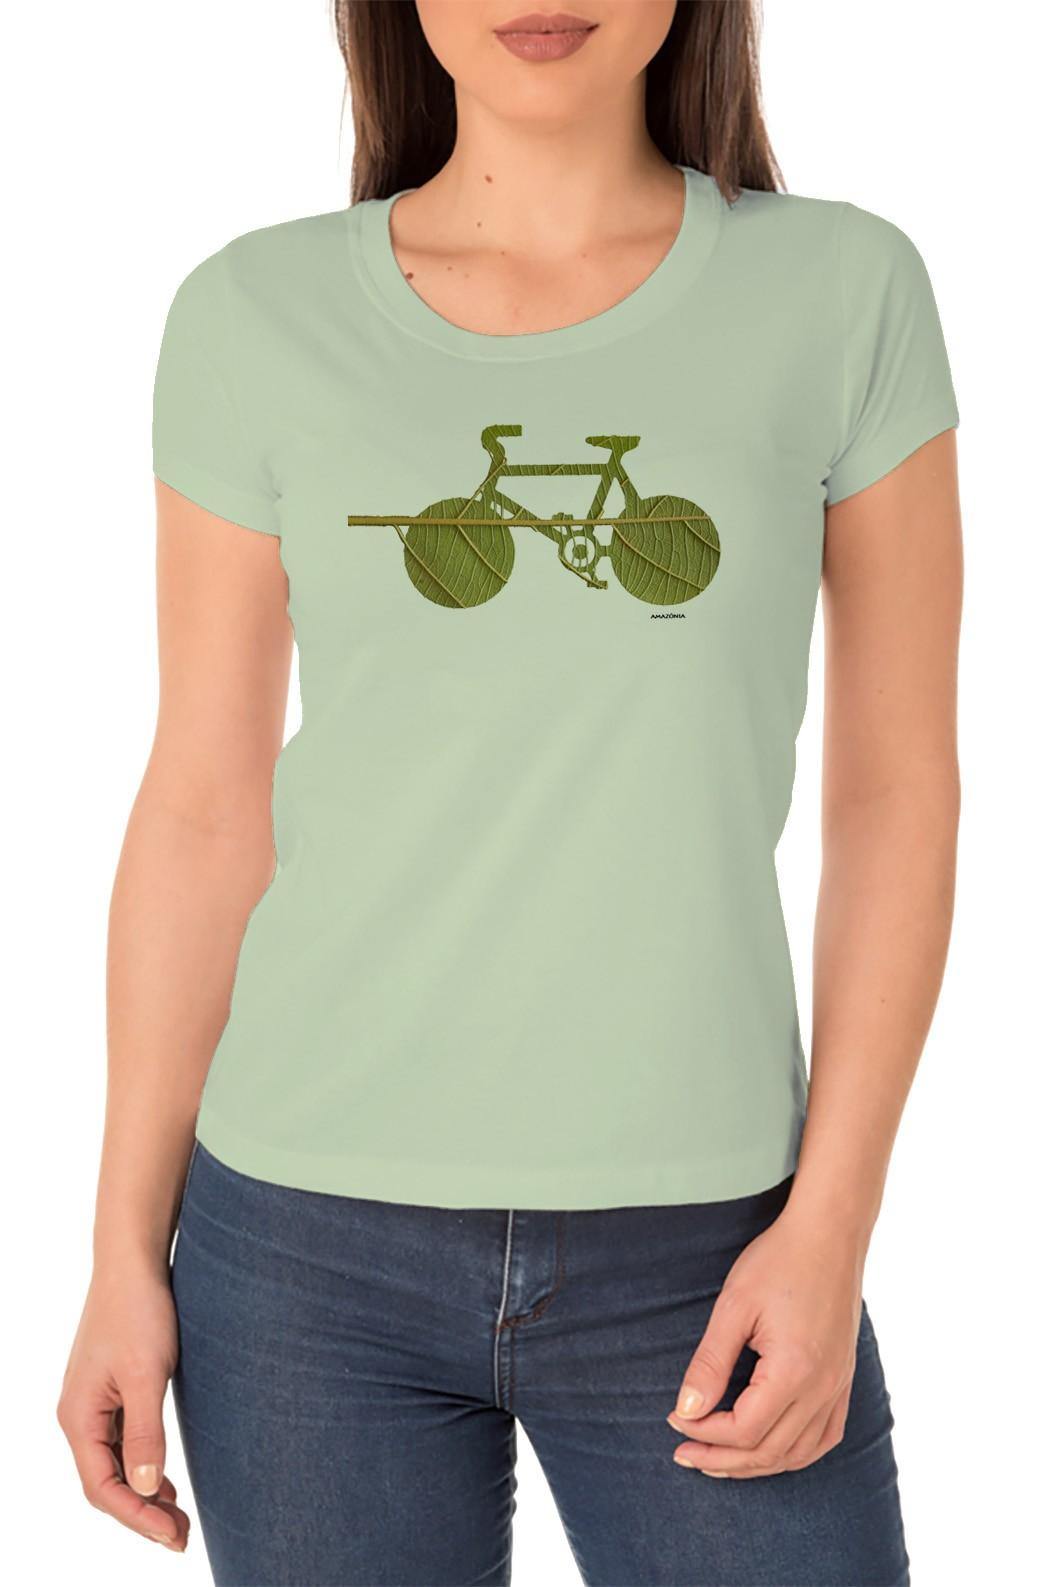 Baby Look Amazônia Bike Folha - Verde/Claro